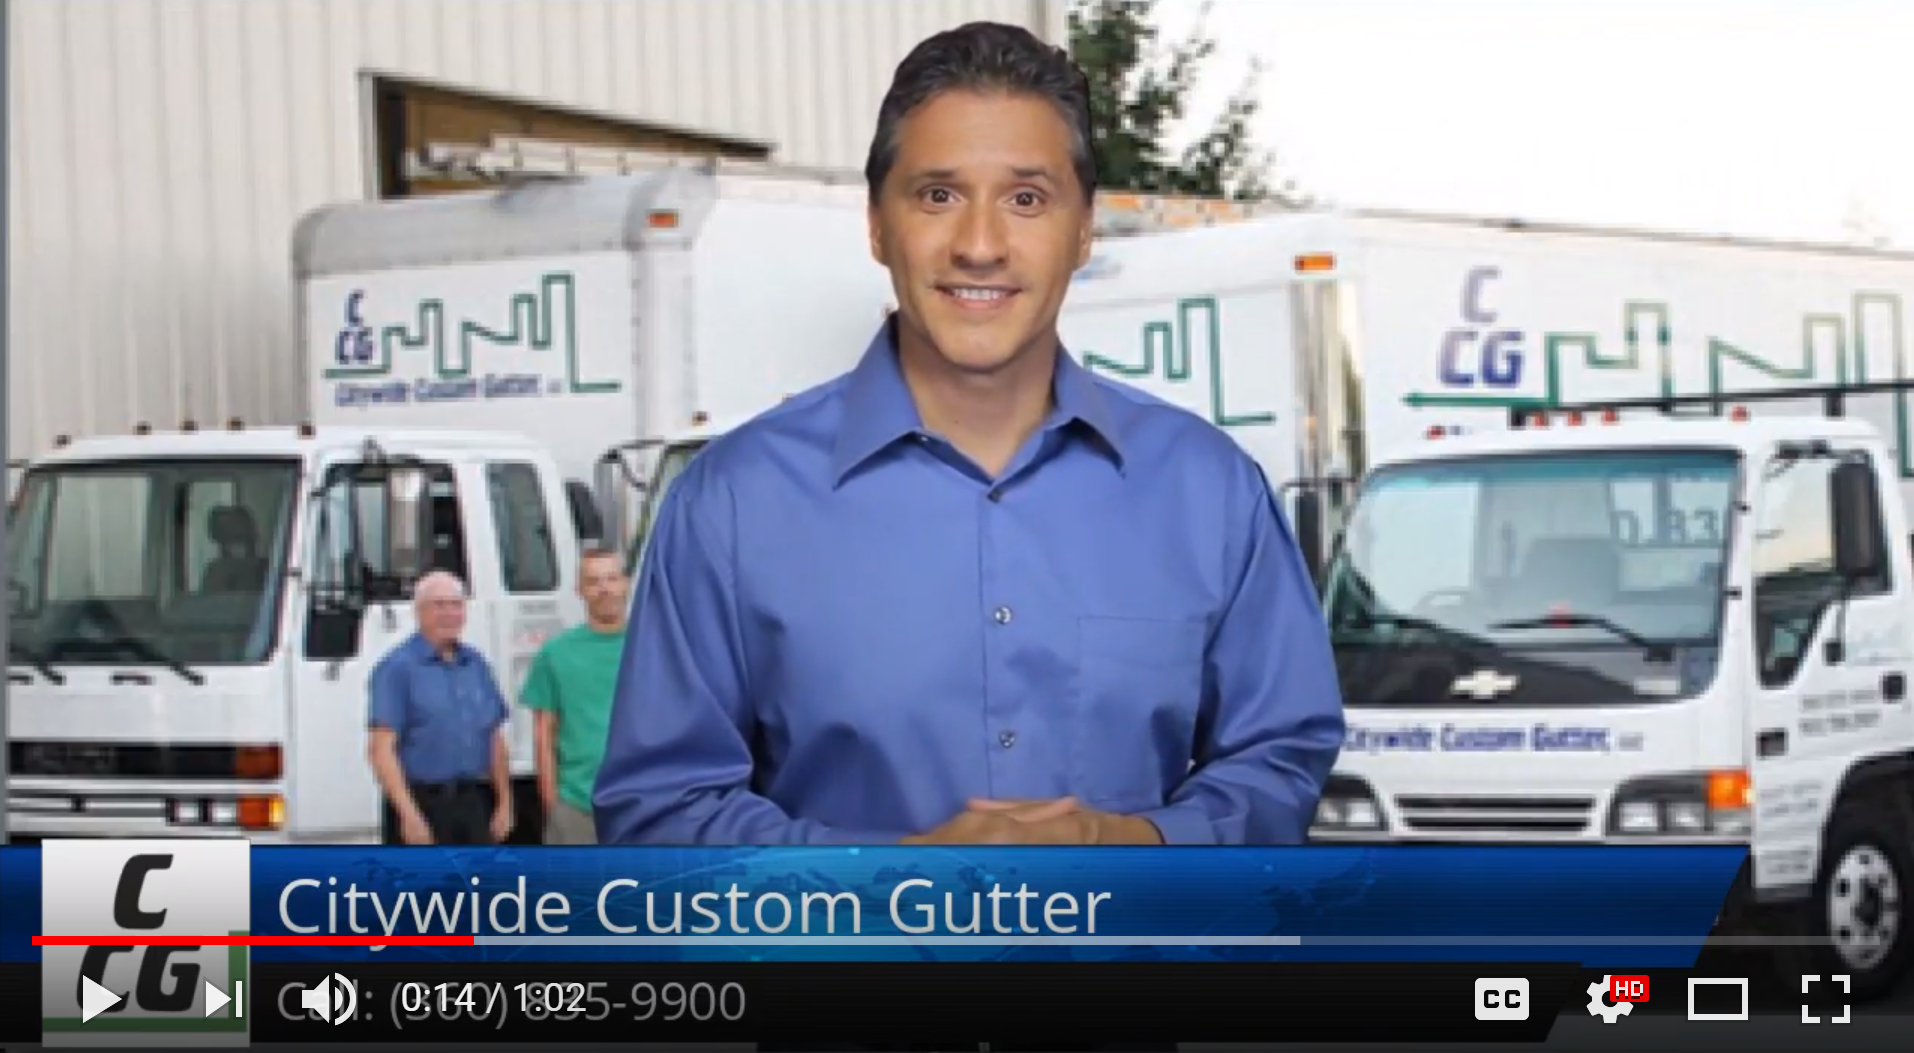 Citywide Custom Gutter 5 Star Review